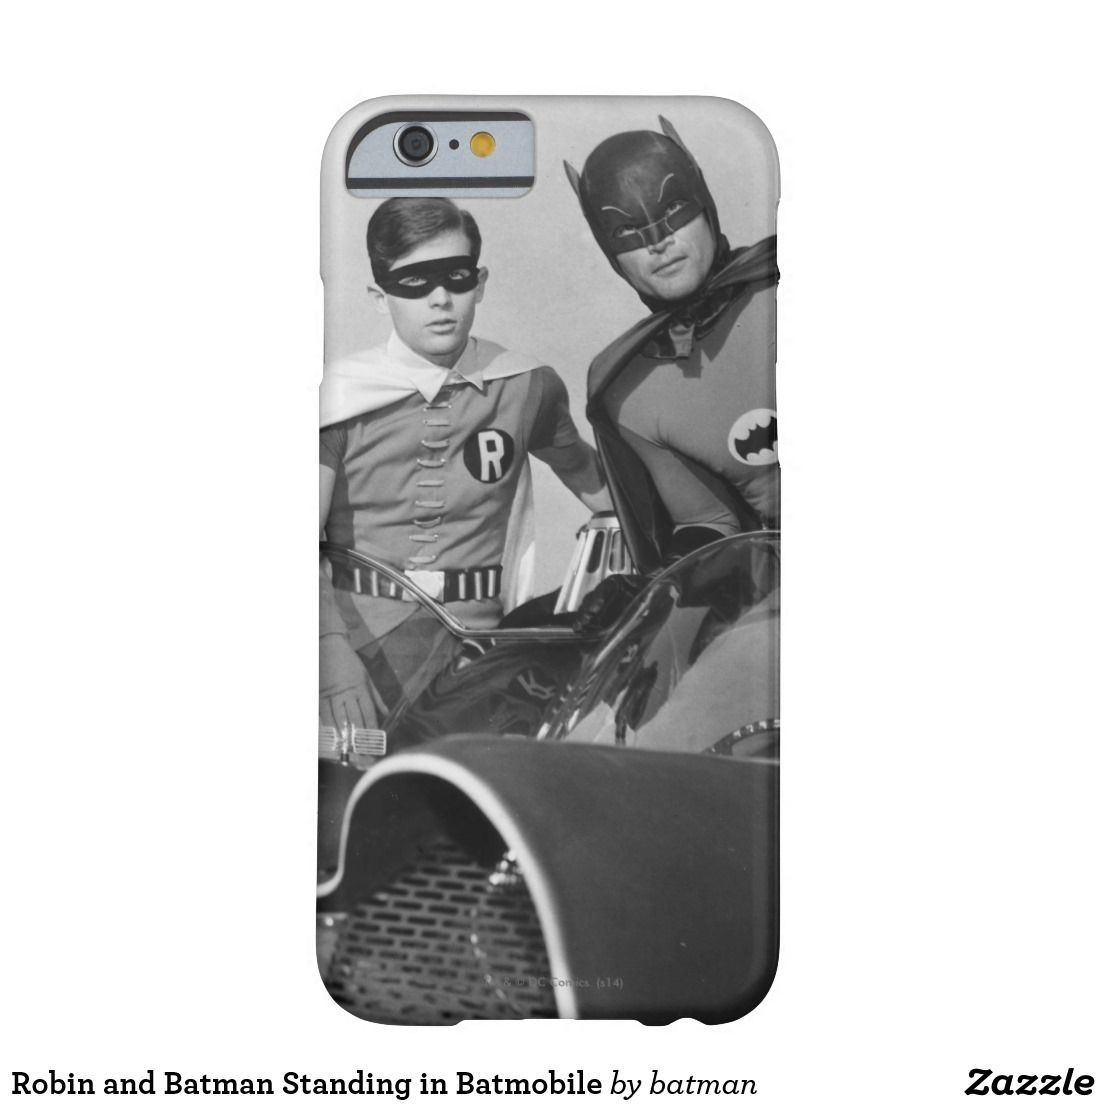 Robin and batman standing in batmobile casemate iphone